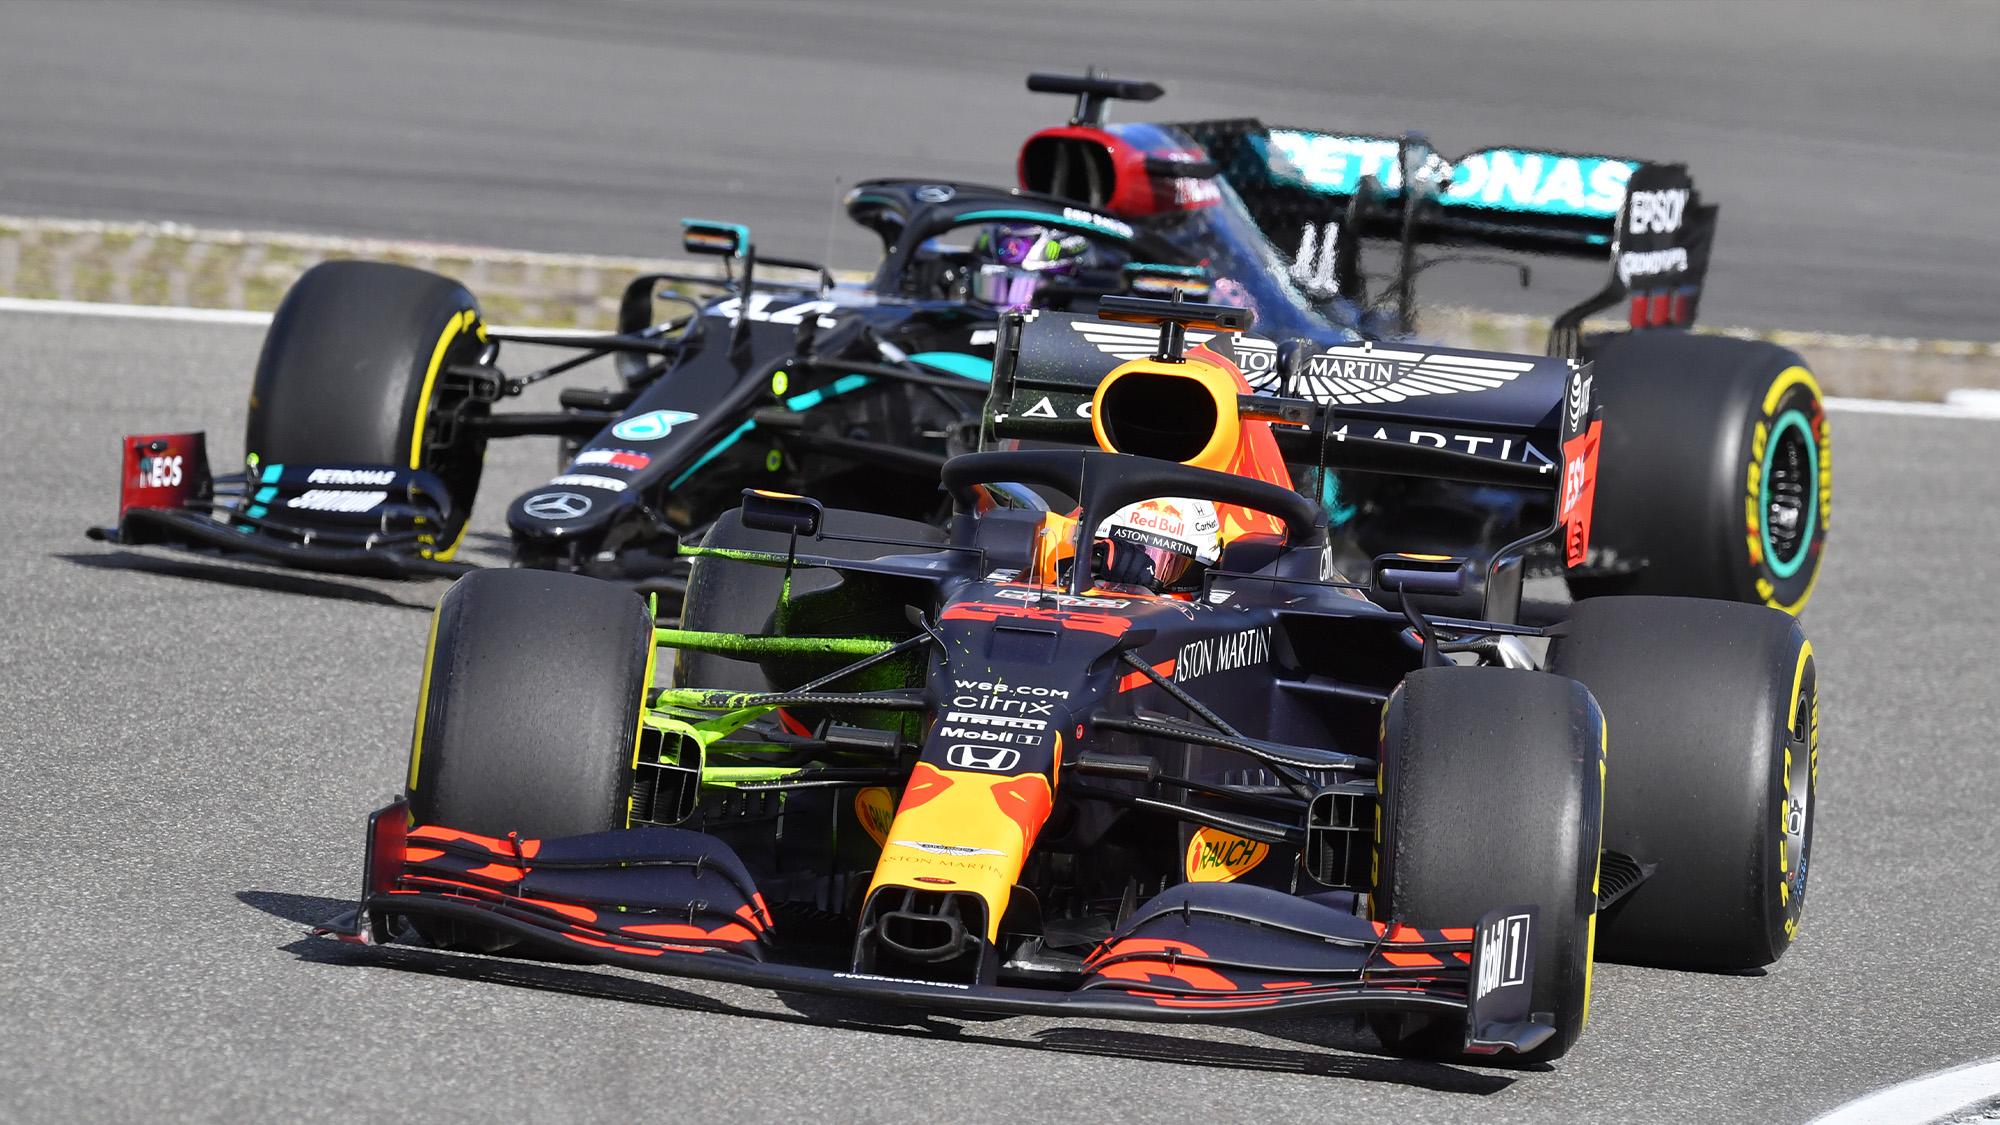 Max Verstappen and Lewis Hamilton in 2021 preseason test